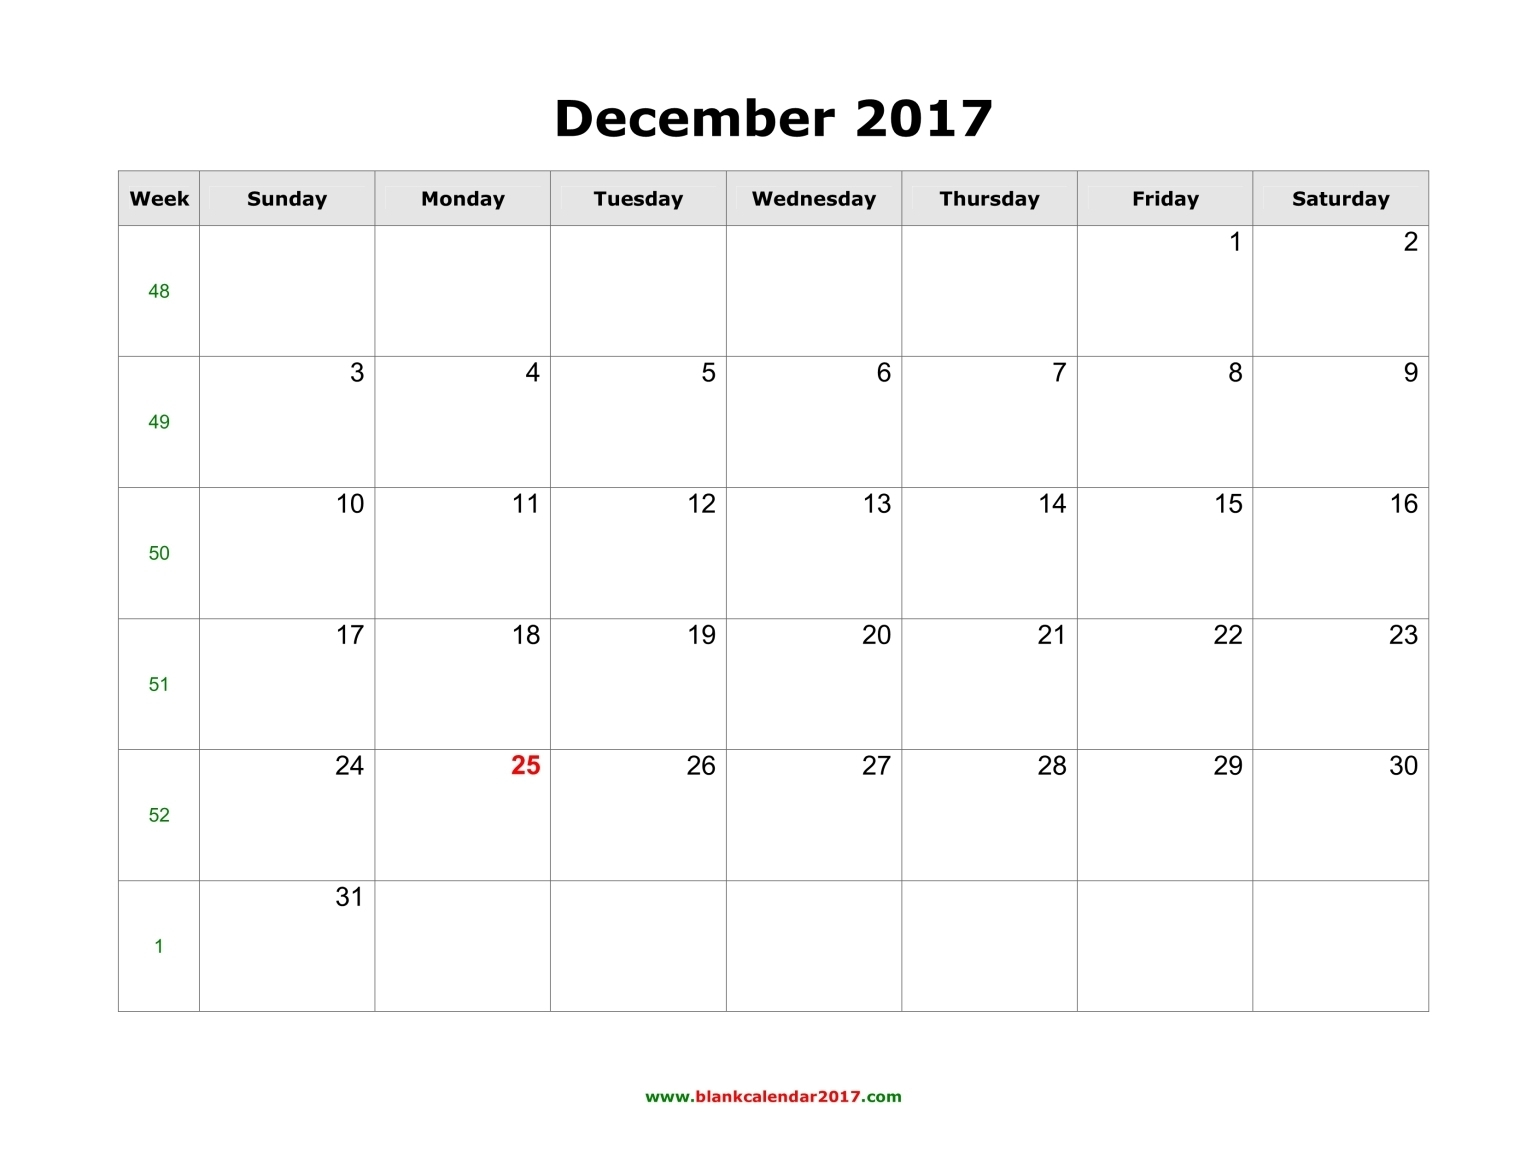 Blank Calendar For December 2017 regarding December Blank Calendar Page Printable